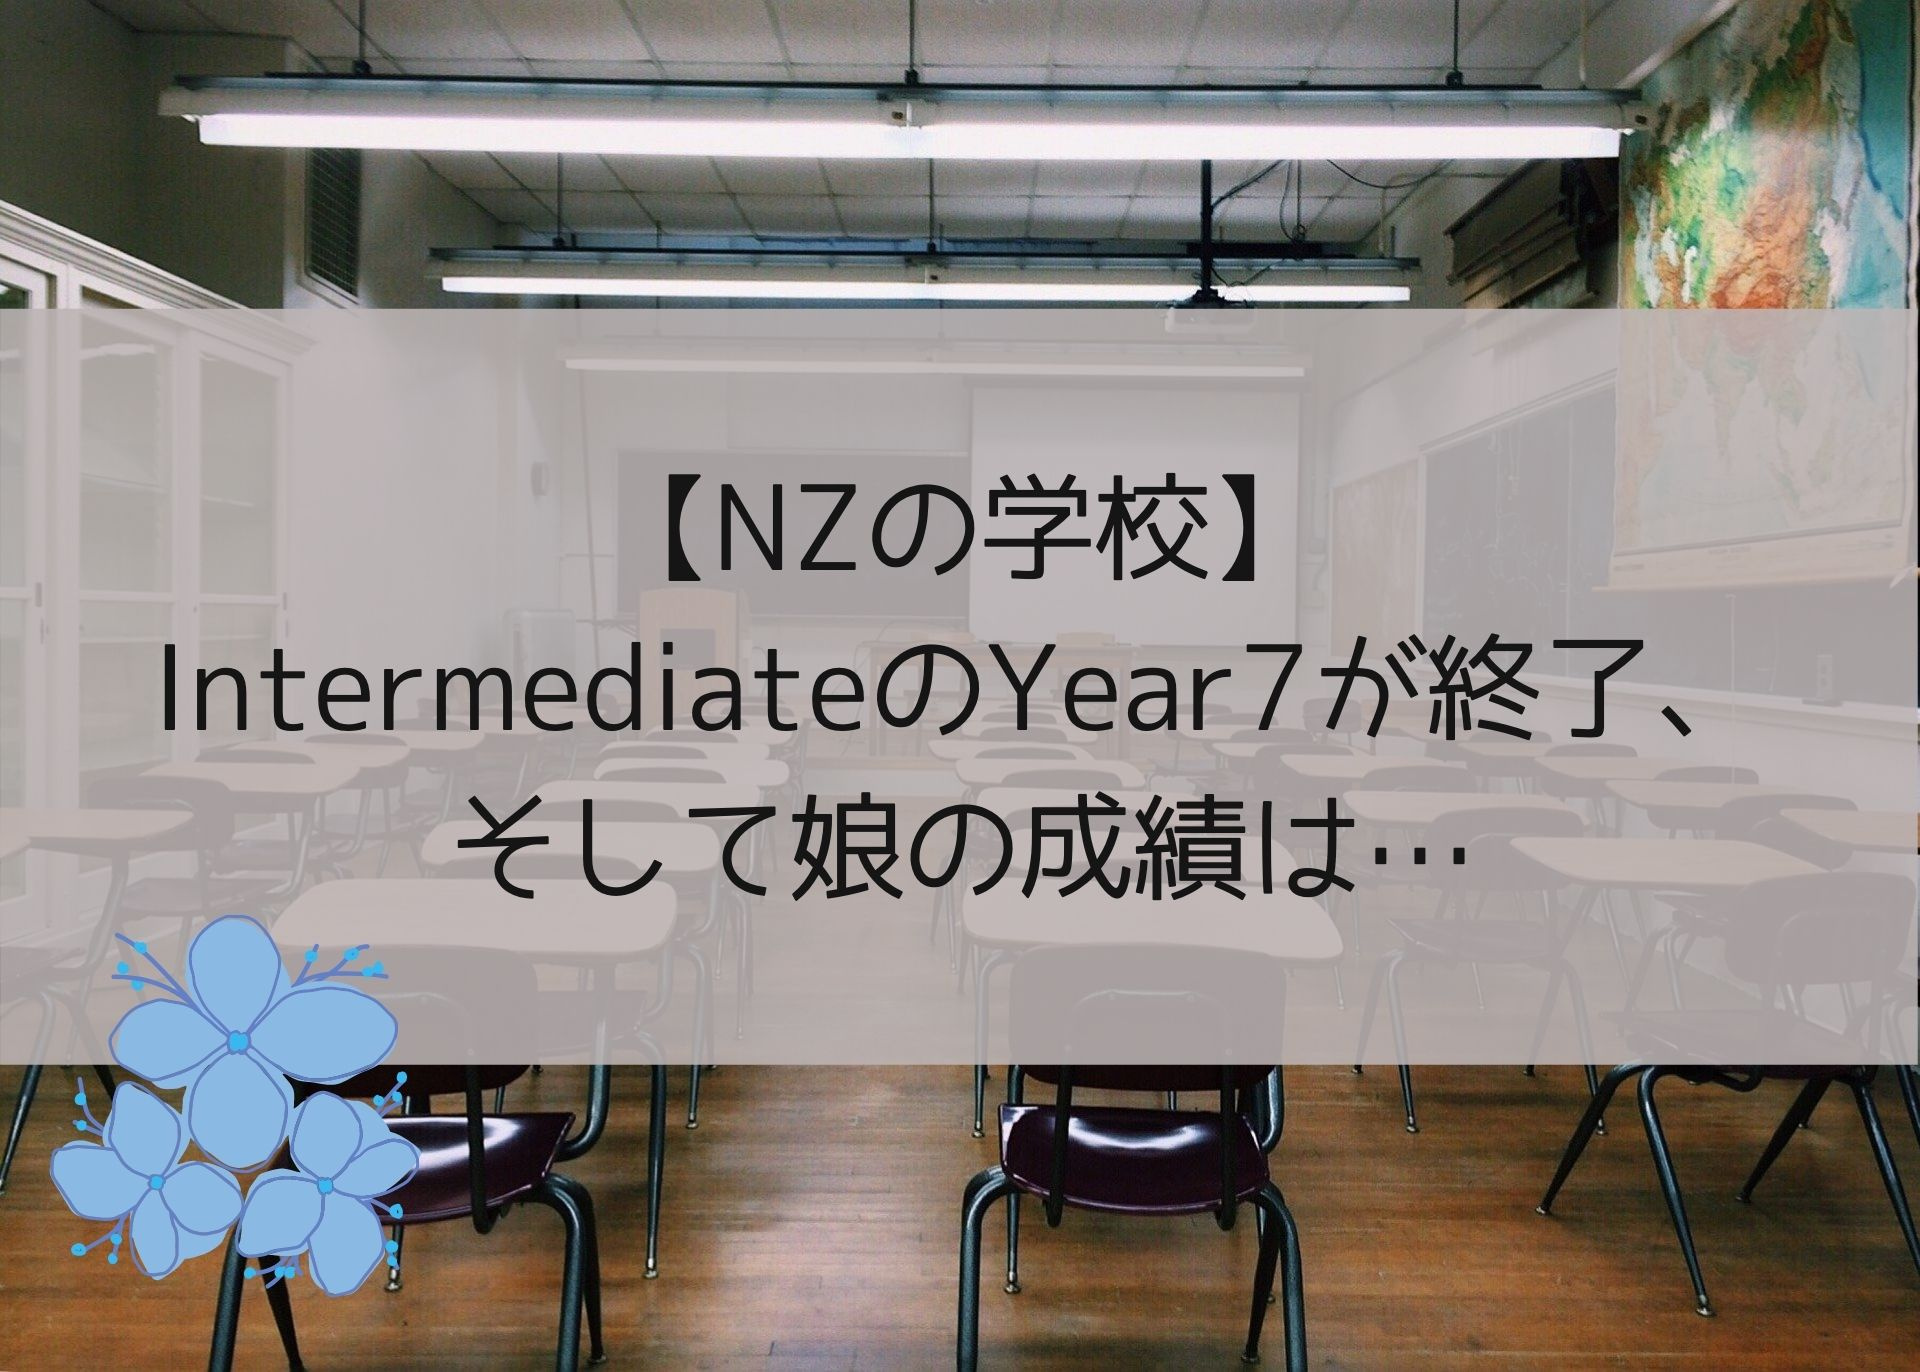 【NZの学校】IntermediateのYear7が終了、そして娘の成績は…